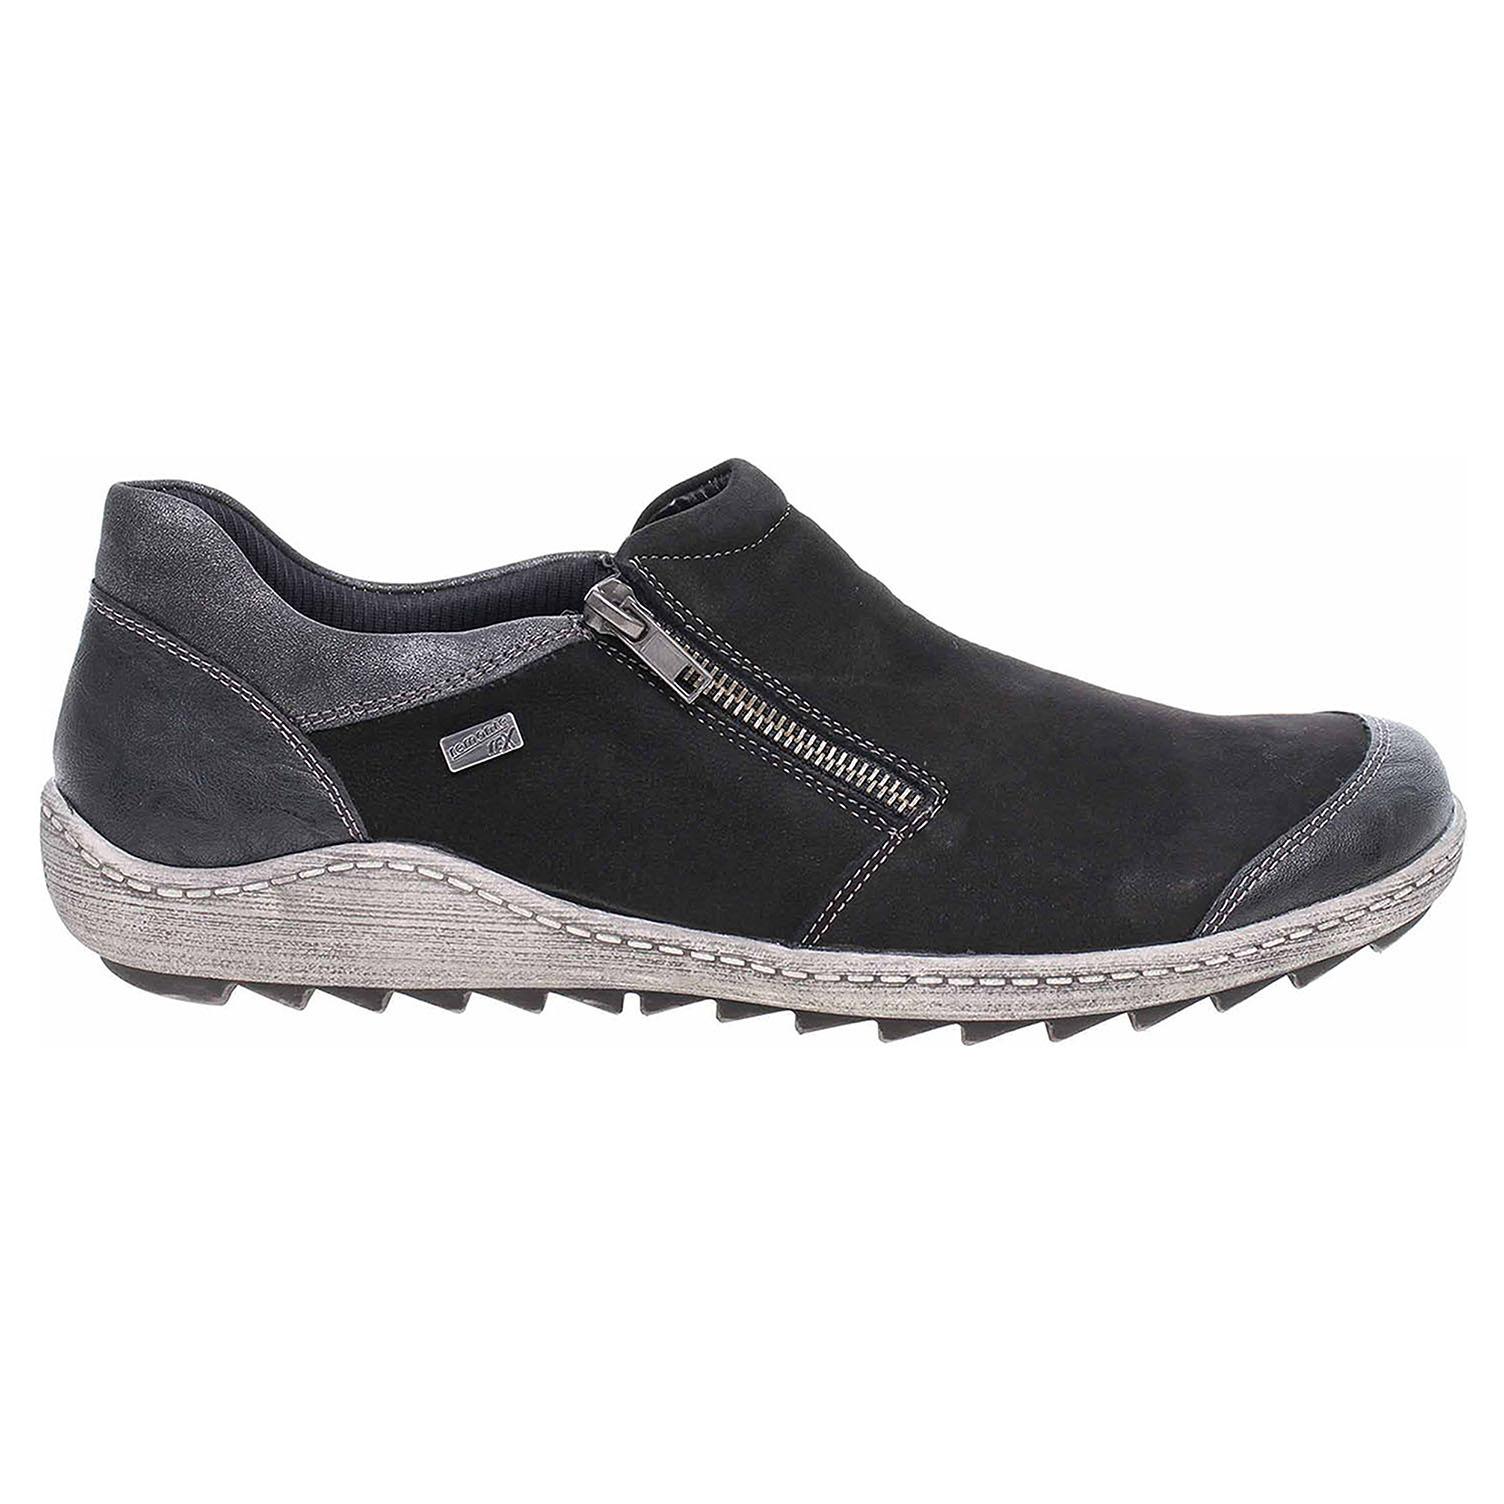 Remonte dámská obuv R1403-02 schwarz kombi R1403-02 43